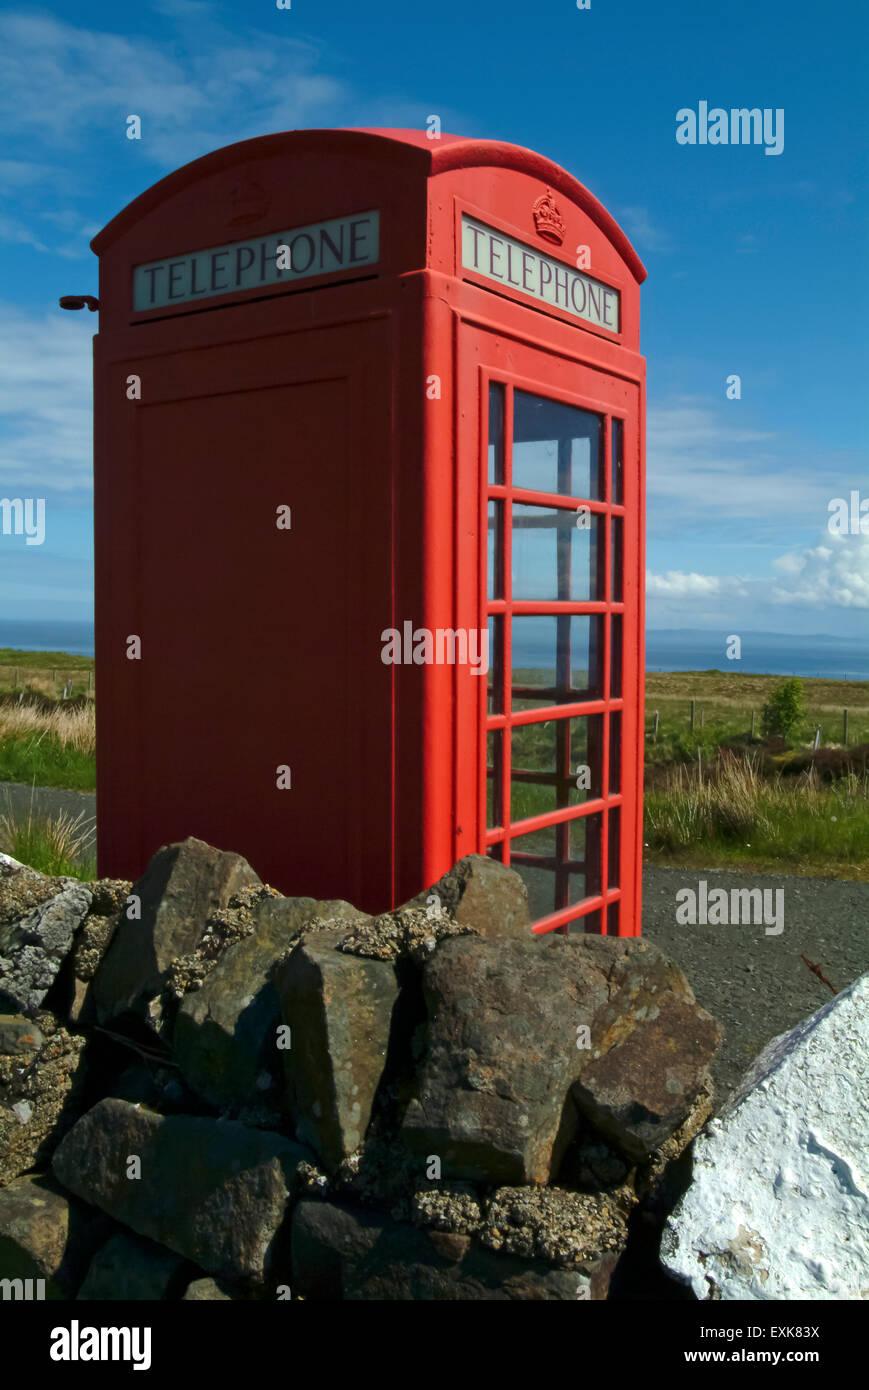 Telephone box in the country, isle of skye, scotland, UK, europe - Stock Image